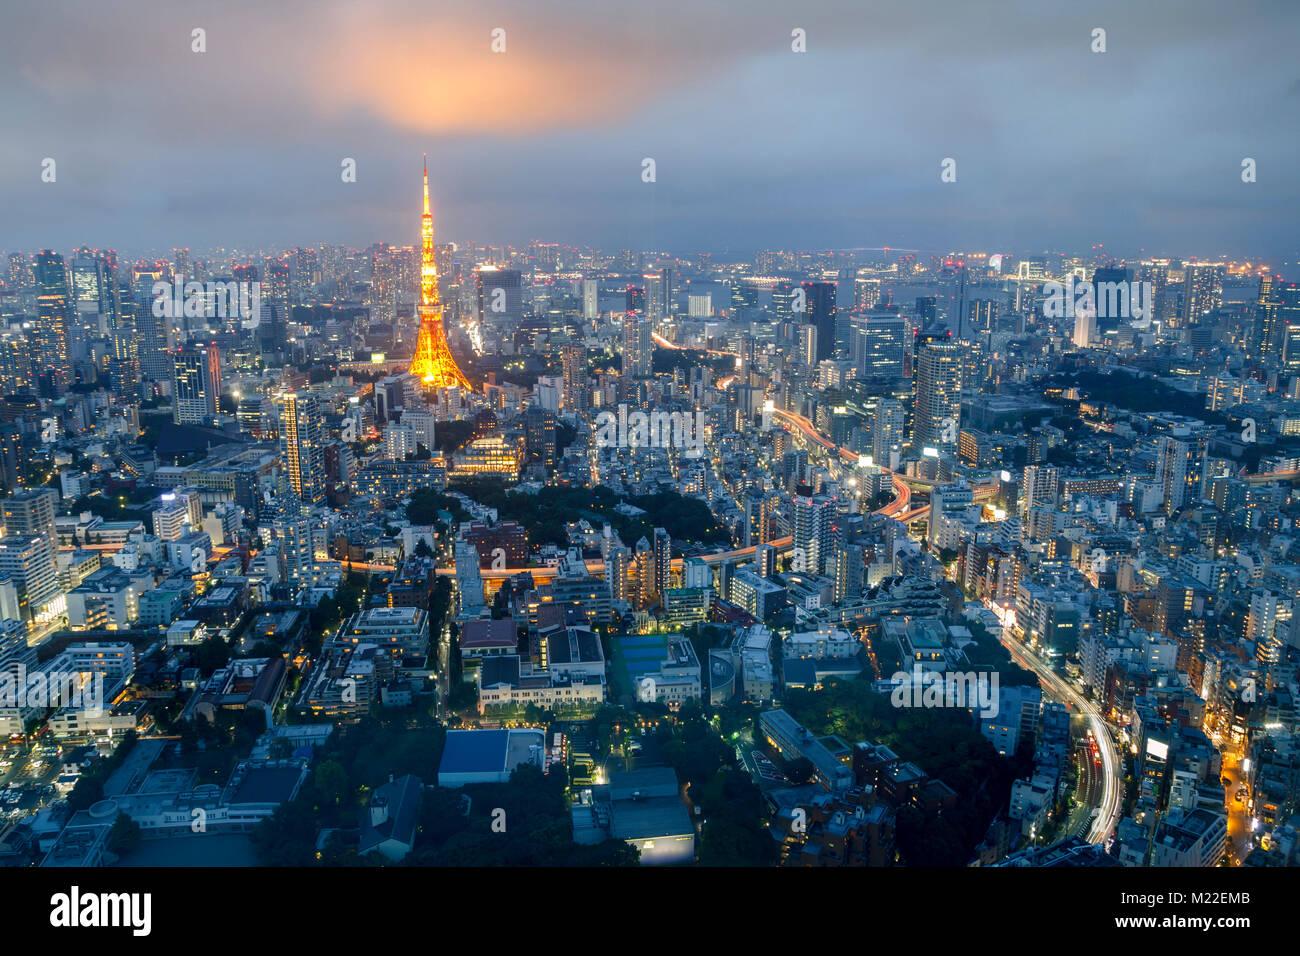 Tokio Skyline bei Sonnenuntergang, mit dem berühmten Turm von Tokio Stockbild